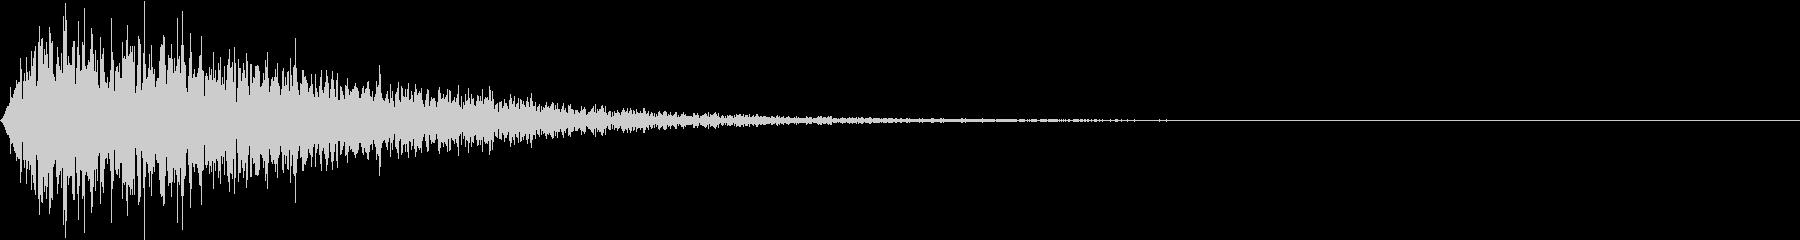 SE 門が開くの未再生の波形